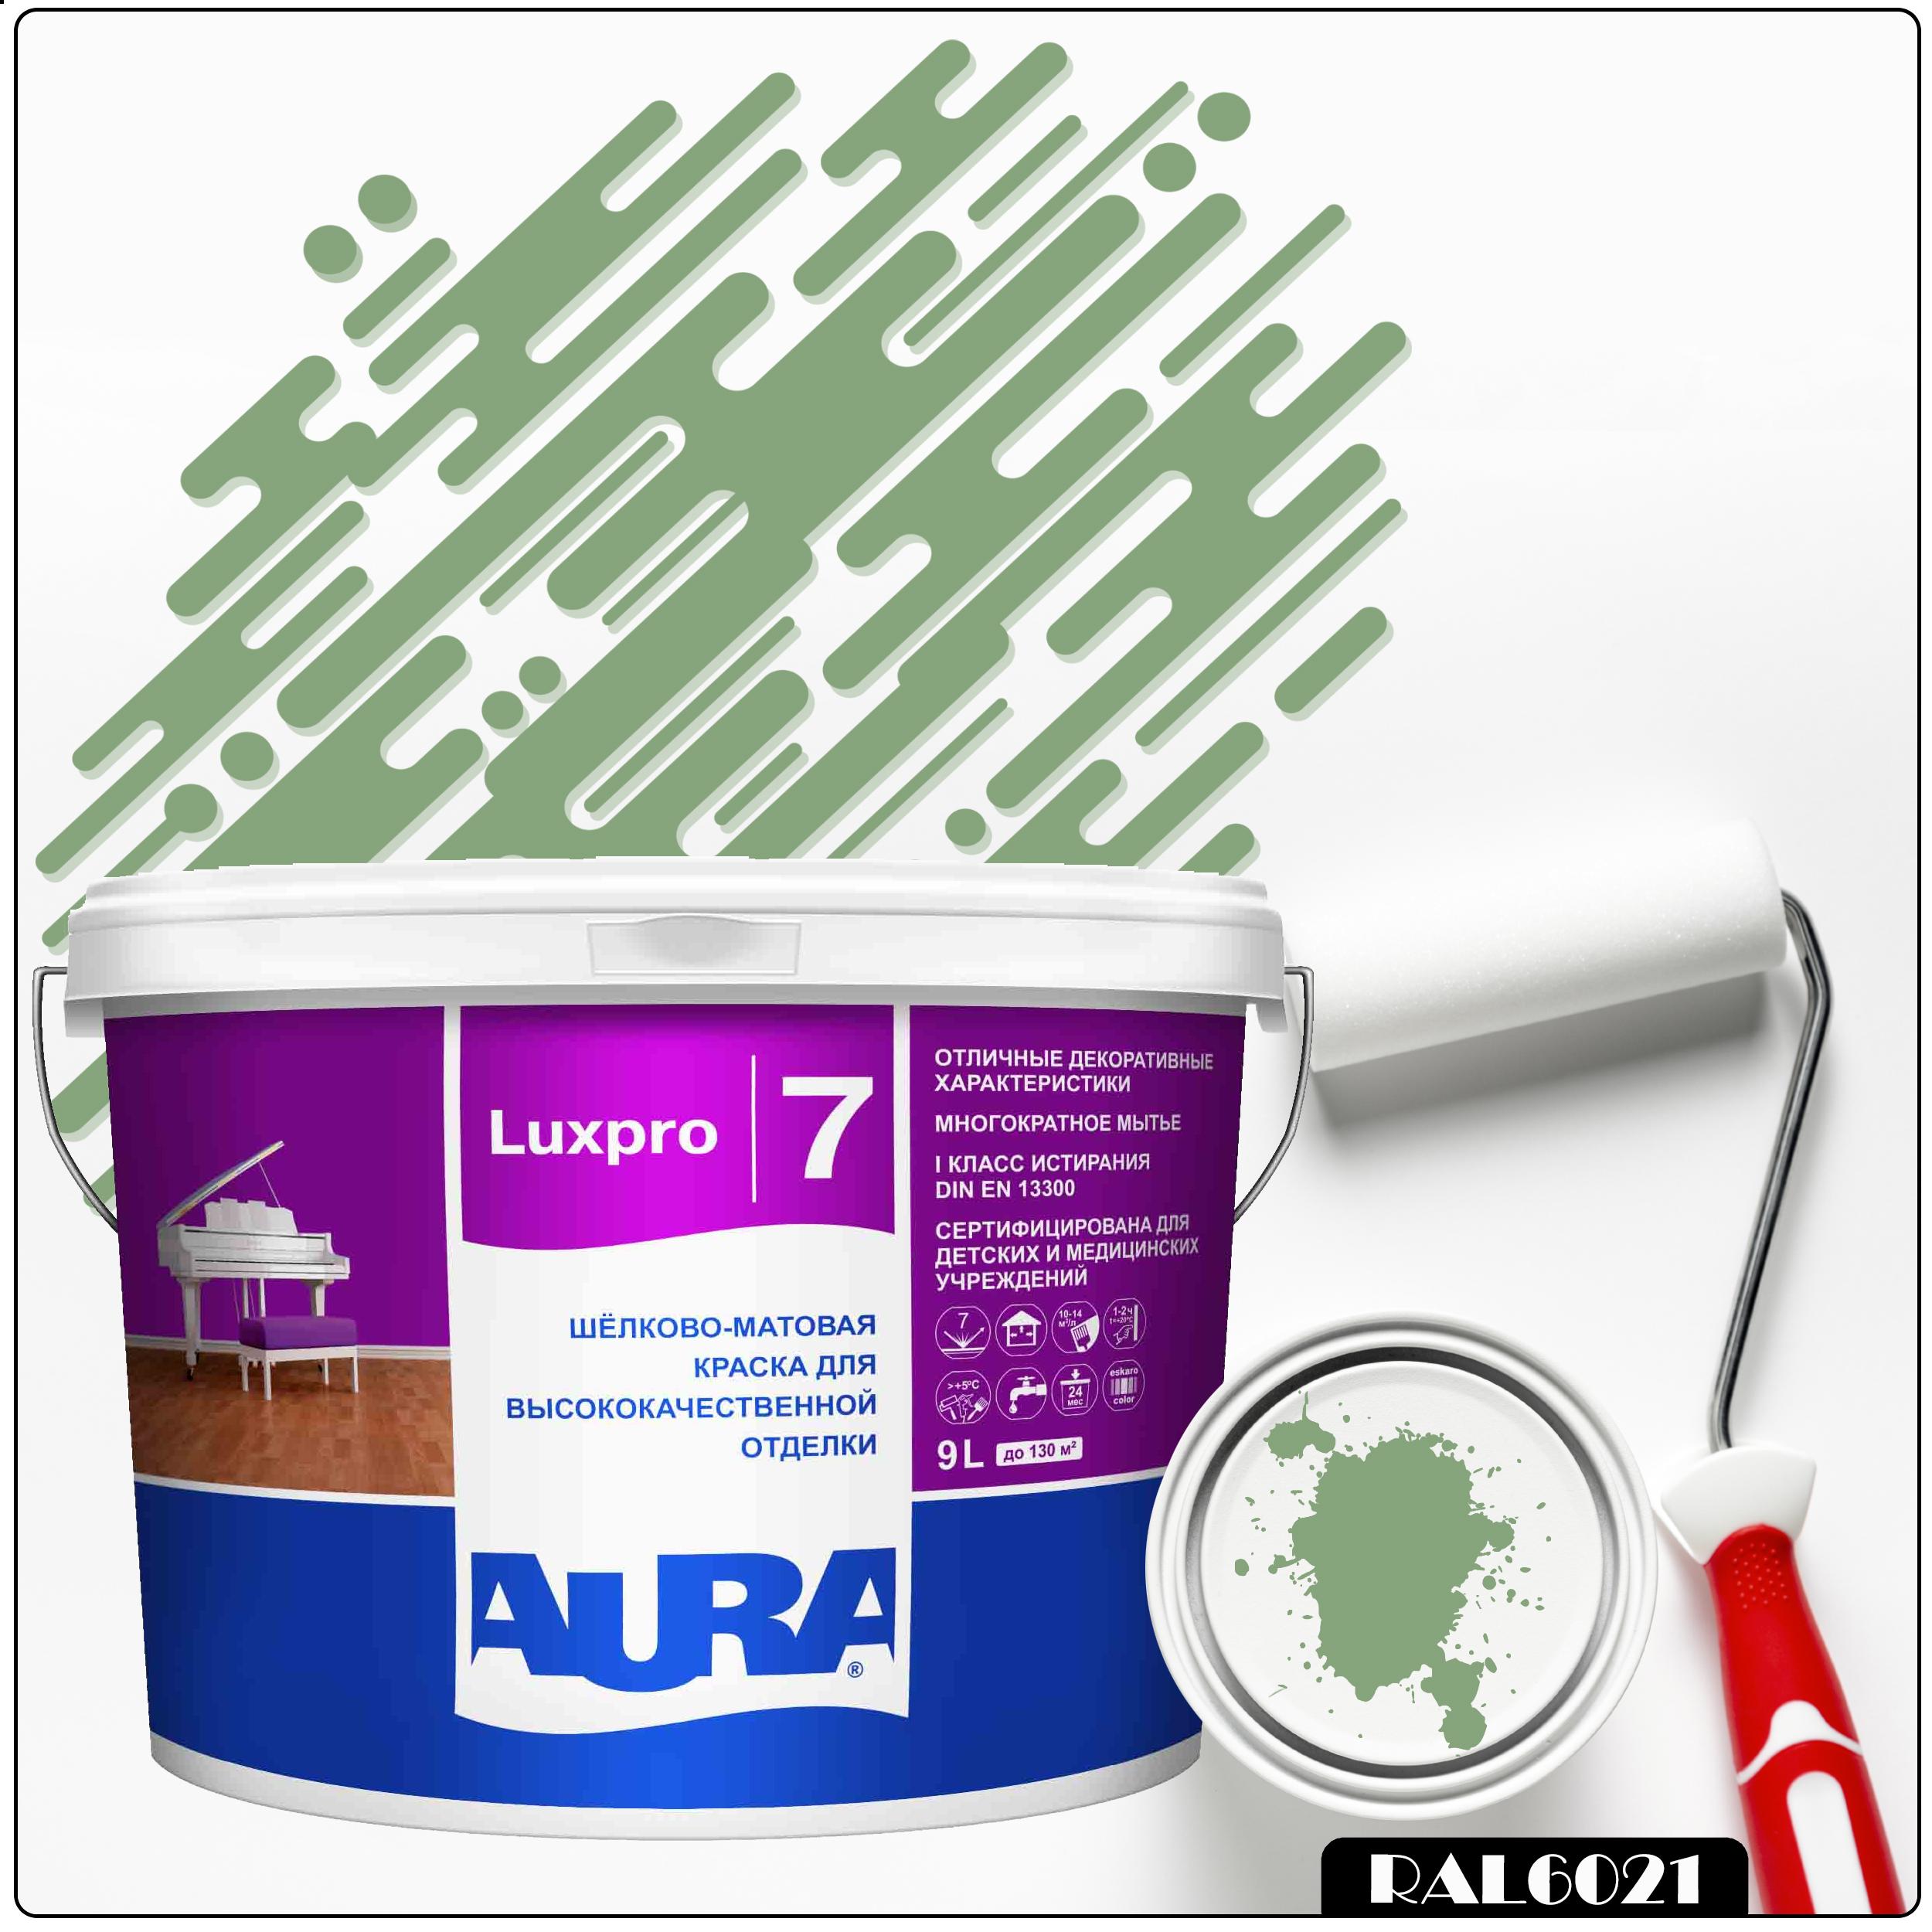 Фото 22 - Краска Aura LuxPRO 7, RAL 6021 Бледно-зеленый, латексная, шелково-матовая, интерьерная, 9л, Аура.